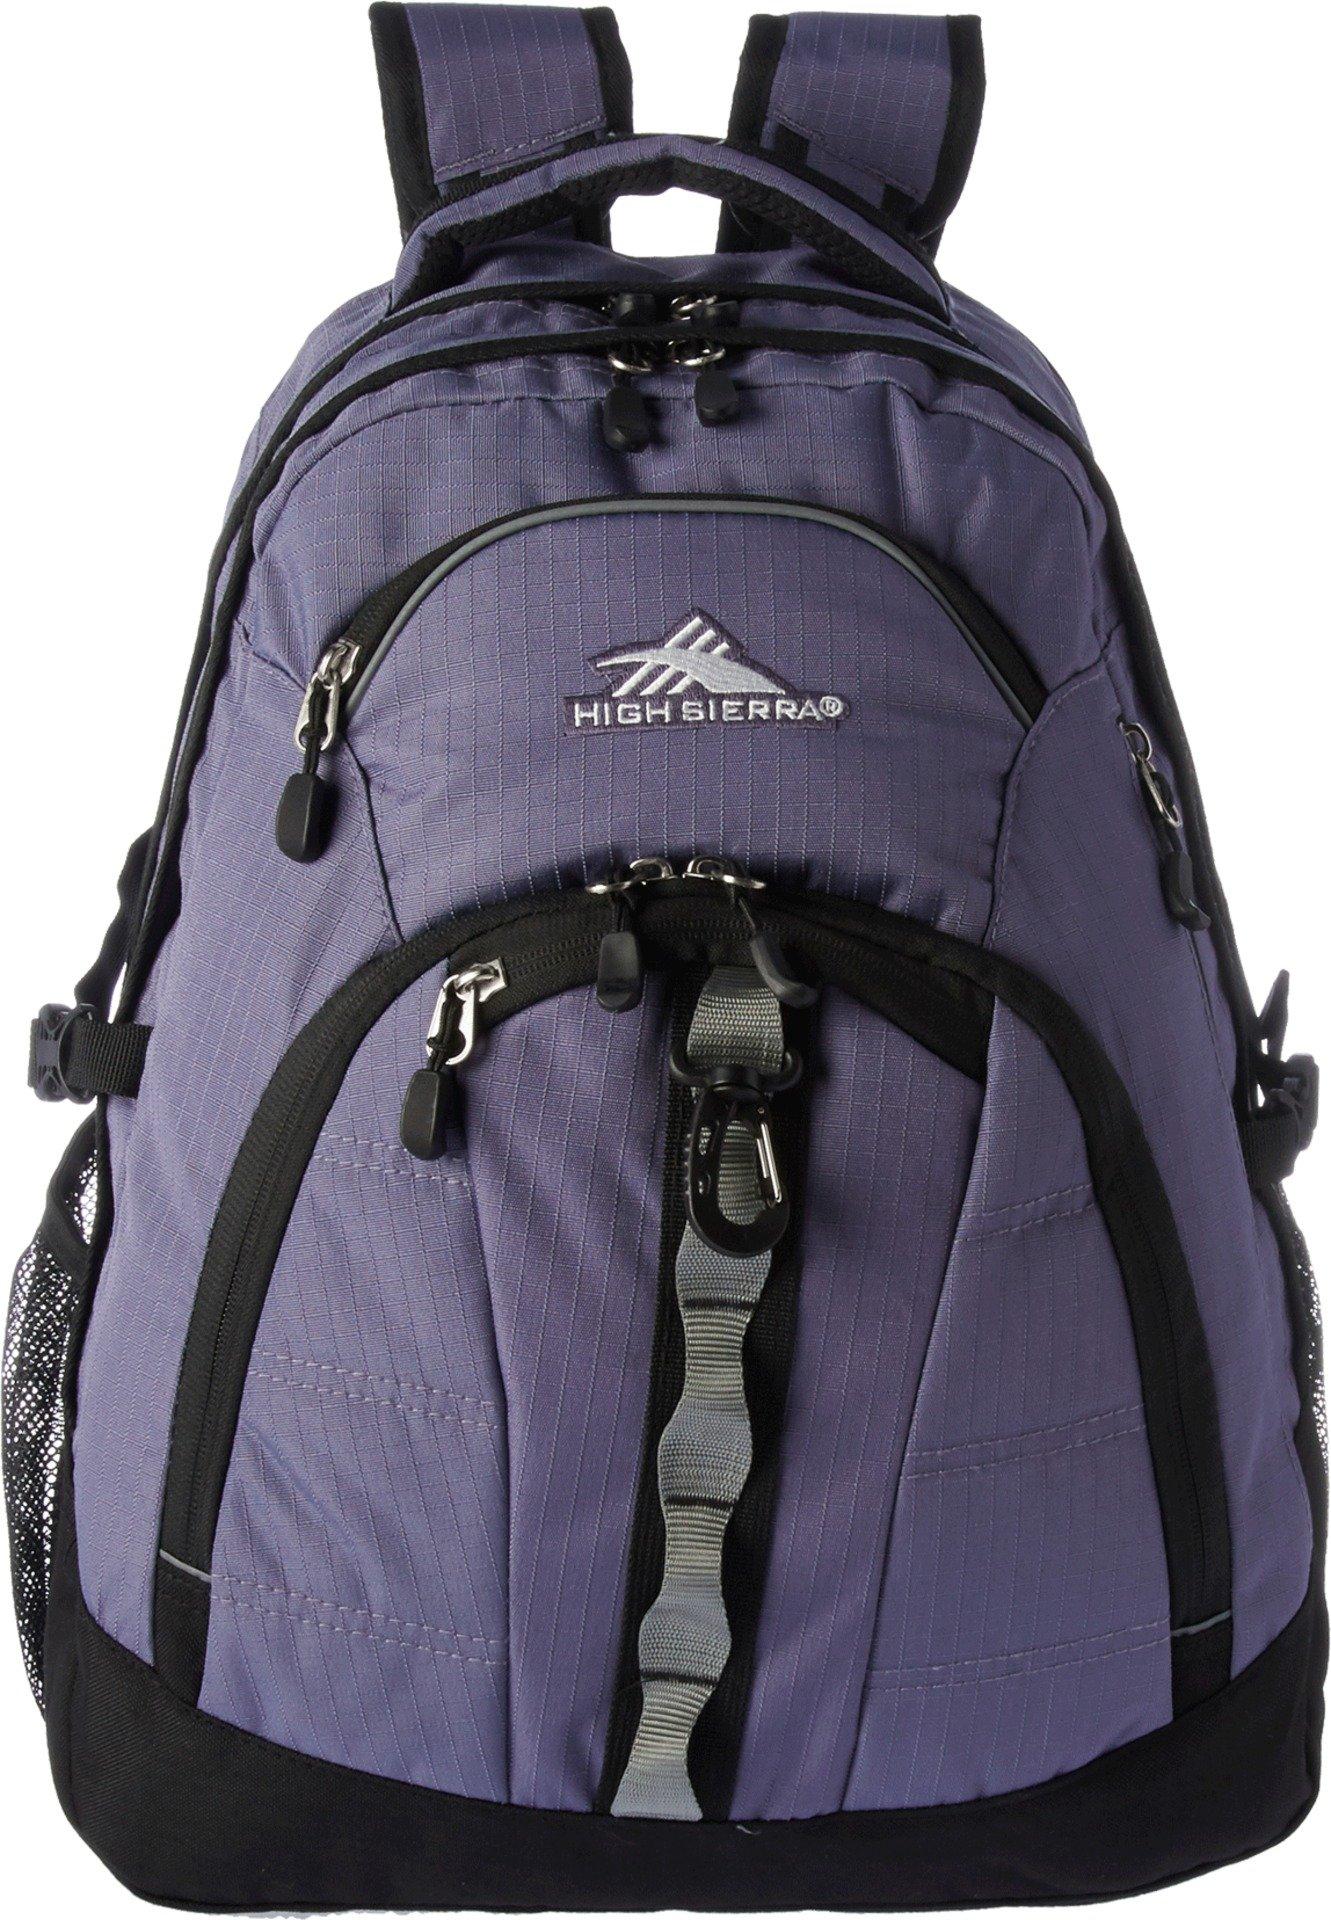 abaa9490e0d1 High Sierra Backpack Access Laptop- Fenix Toulouse Handball